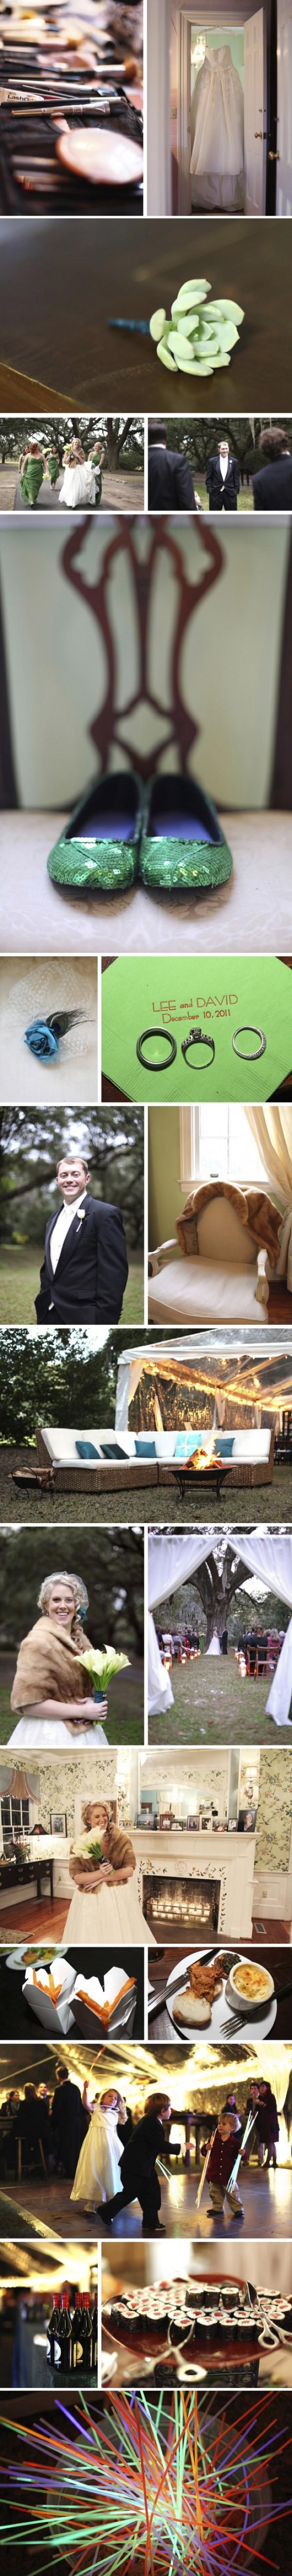 Wedding blogs | southern weddings